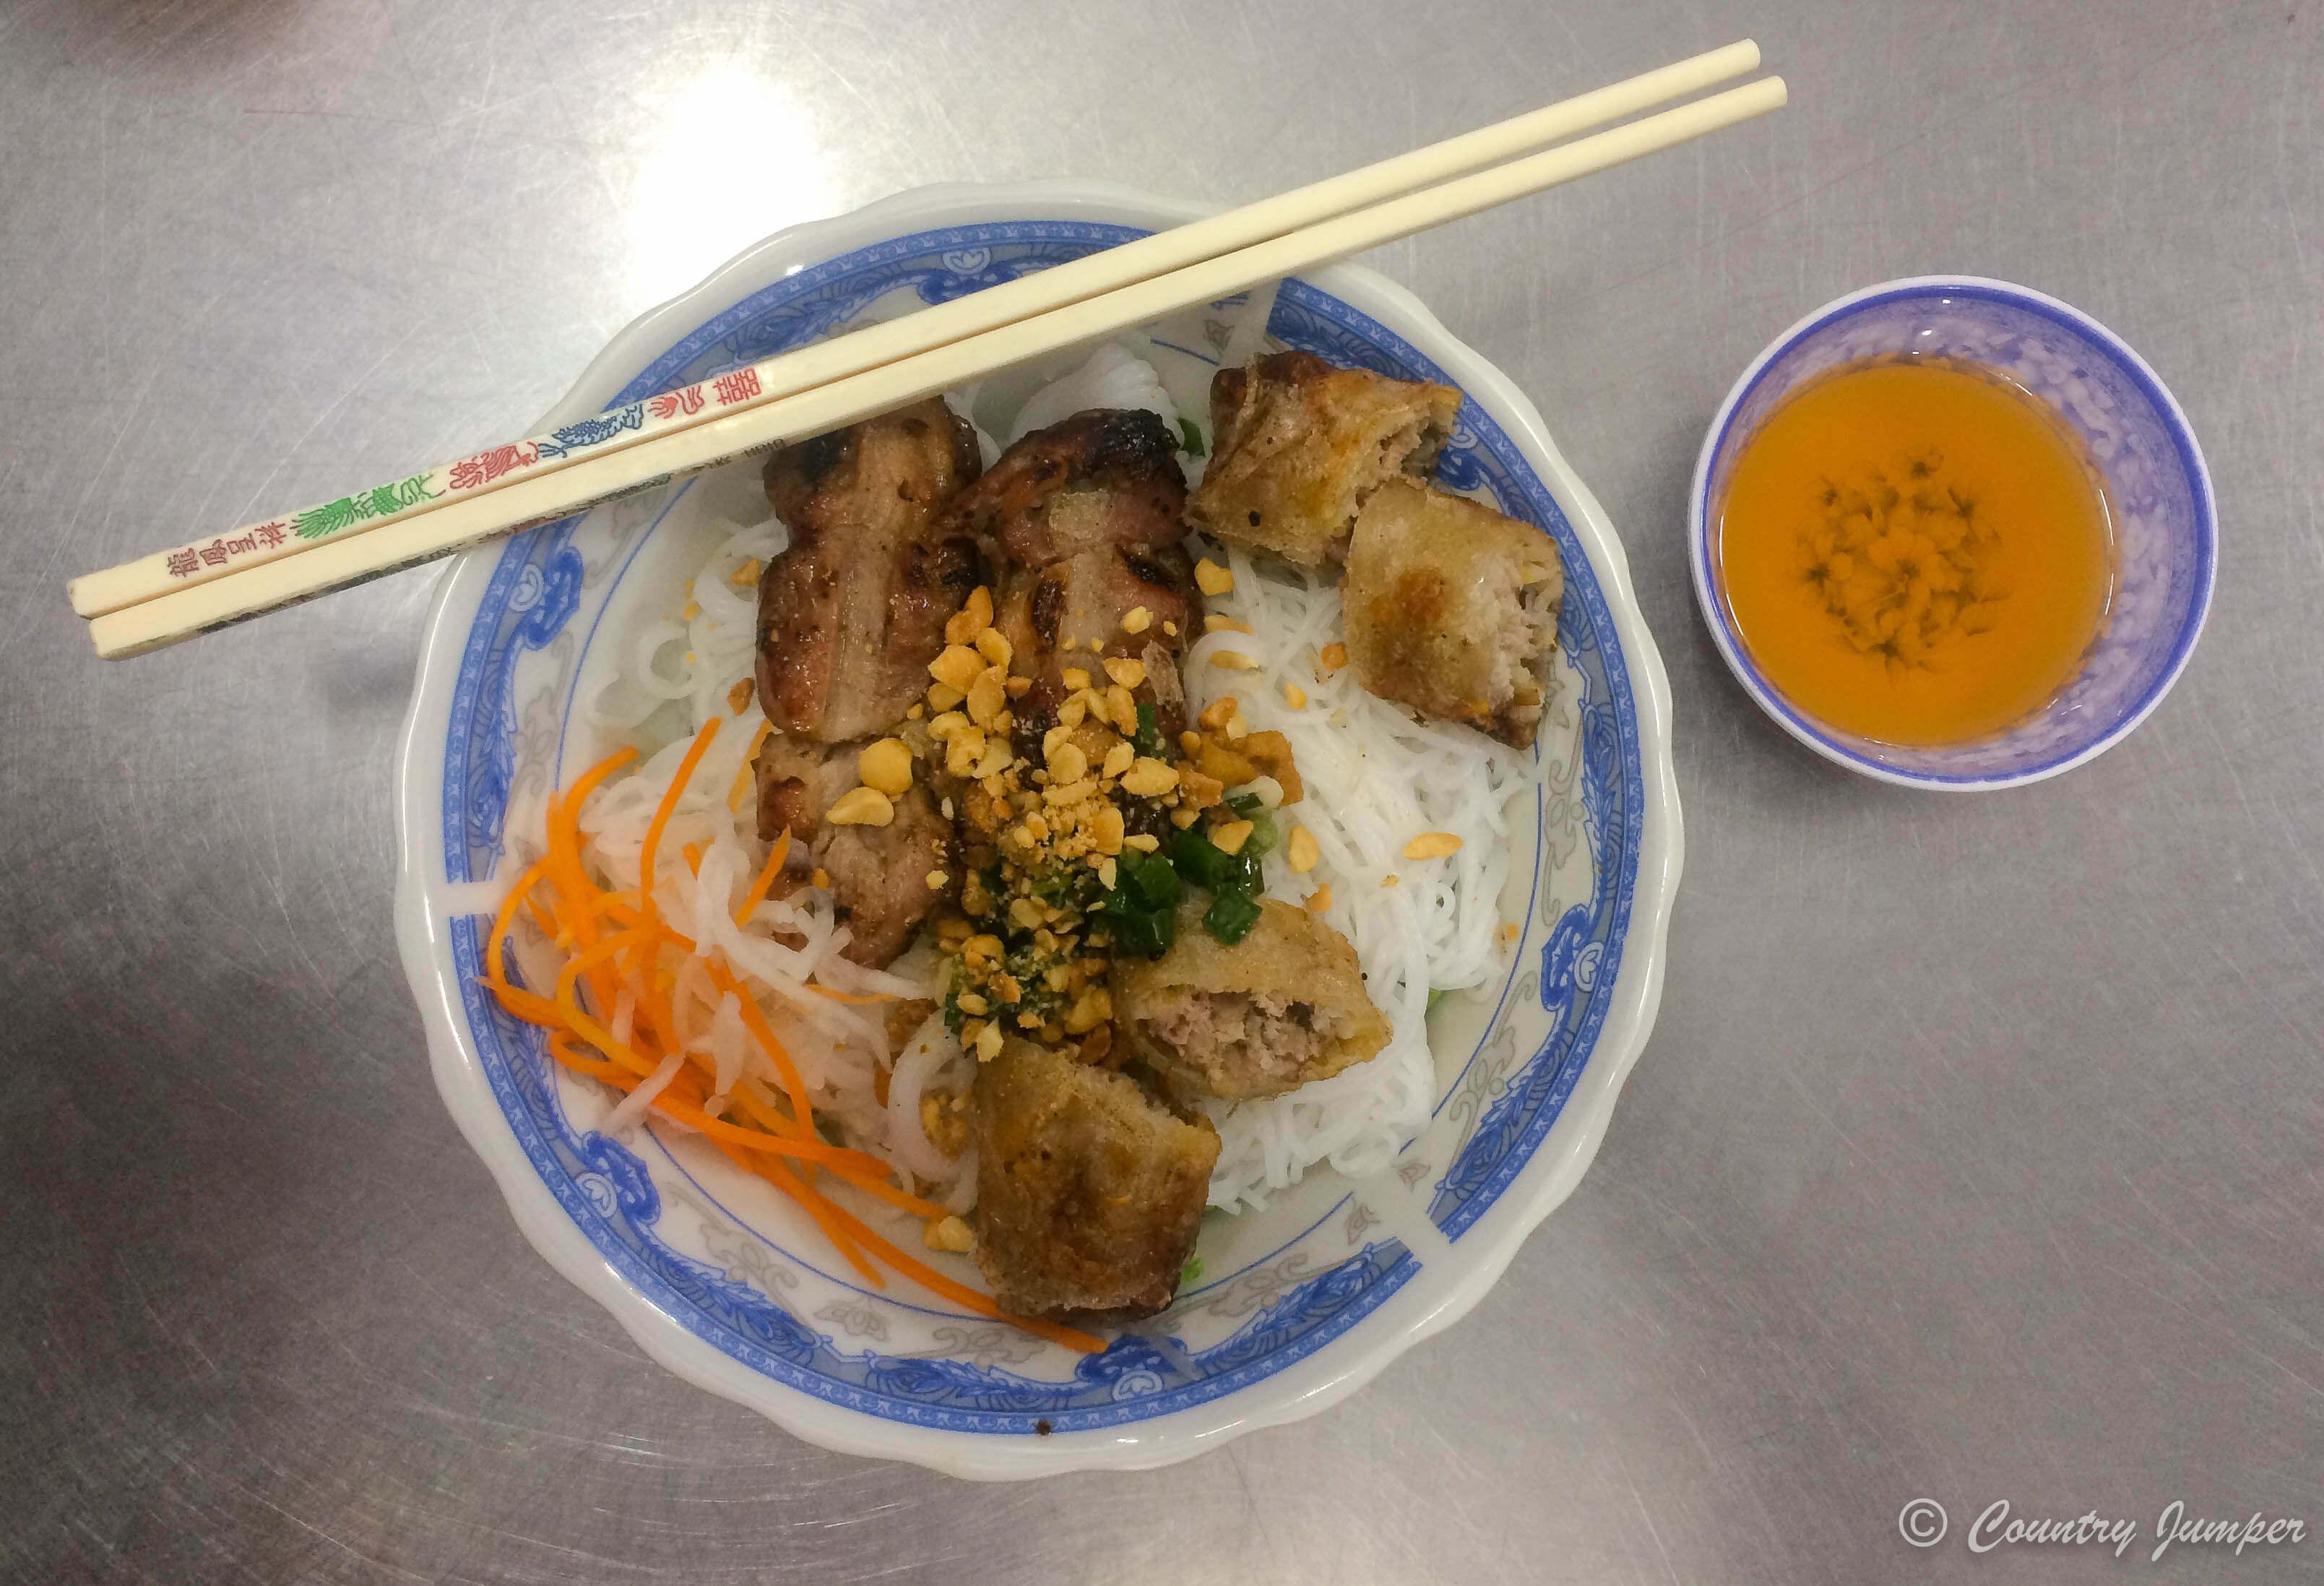 Bún Thịt Nướng - best Vietnamese street food